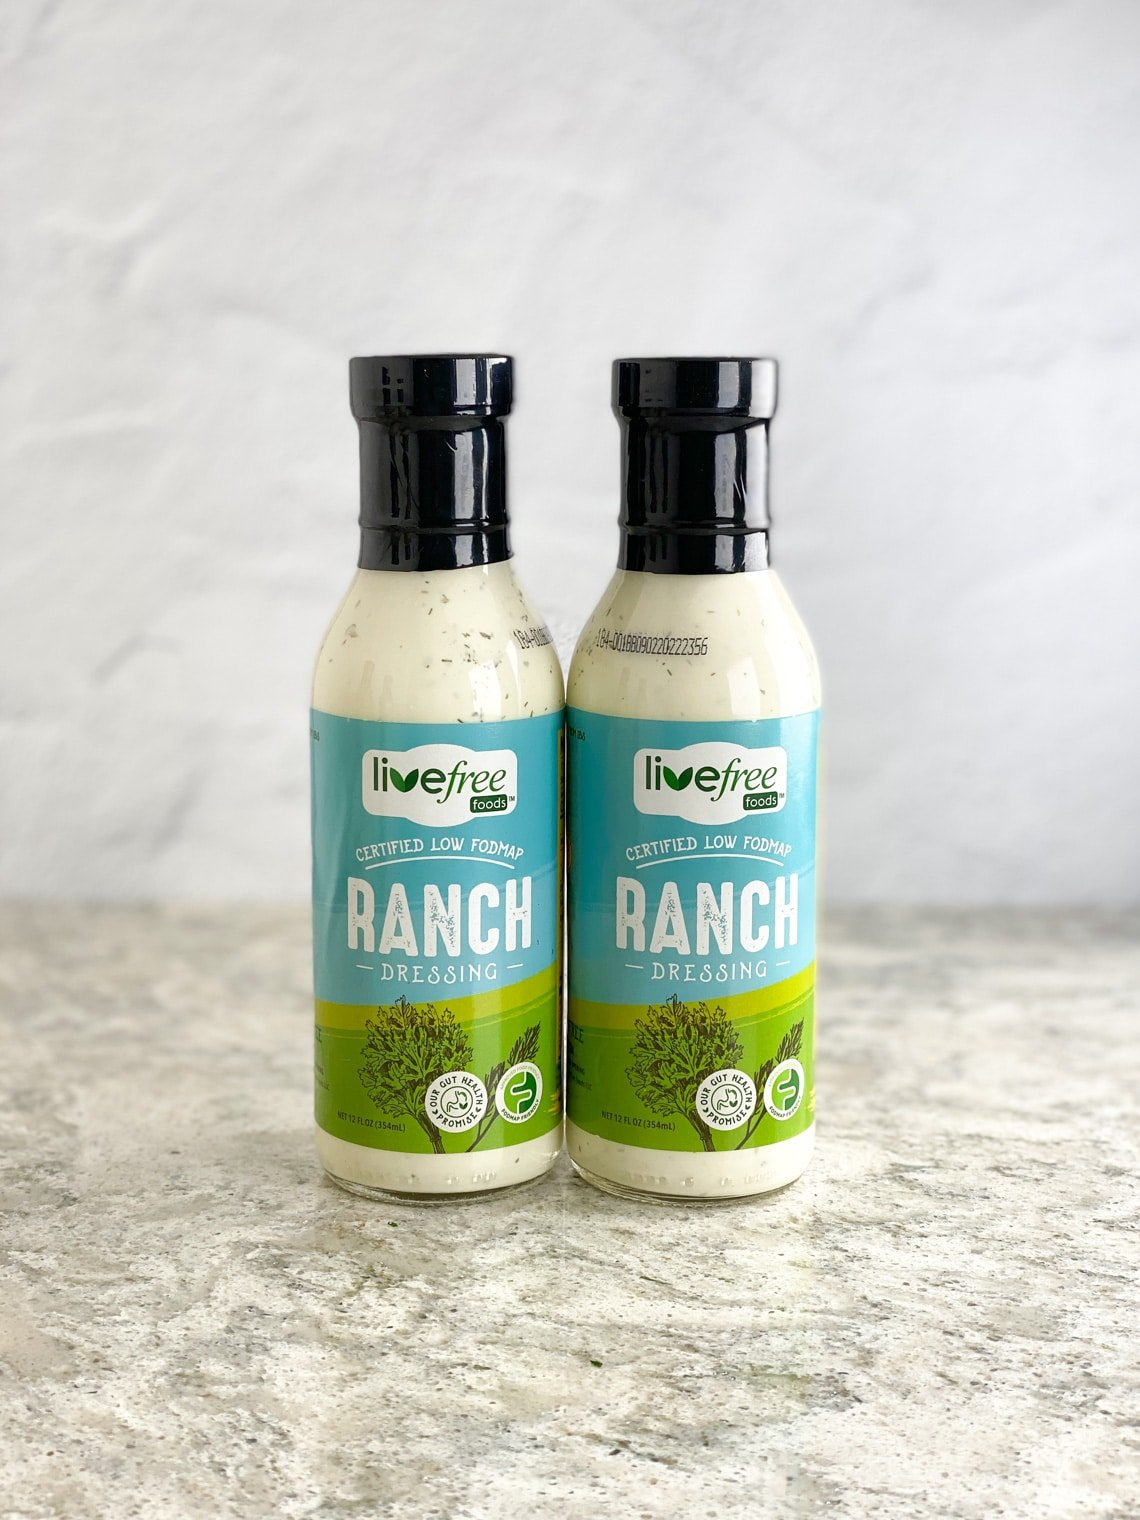 Live Free Ranch bottles 2